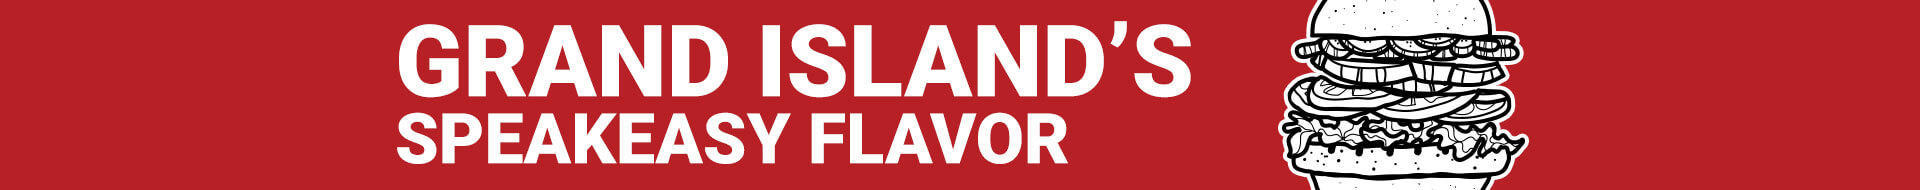 Grand Island, Nebraska's Speakeasy Flavor